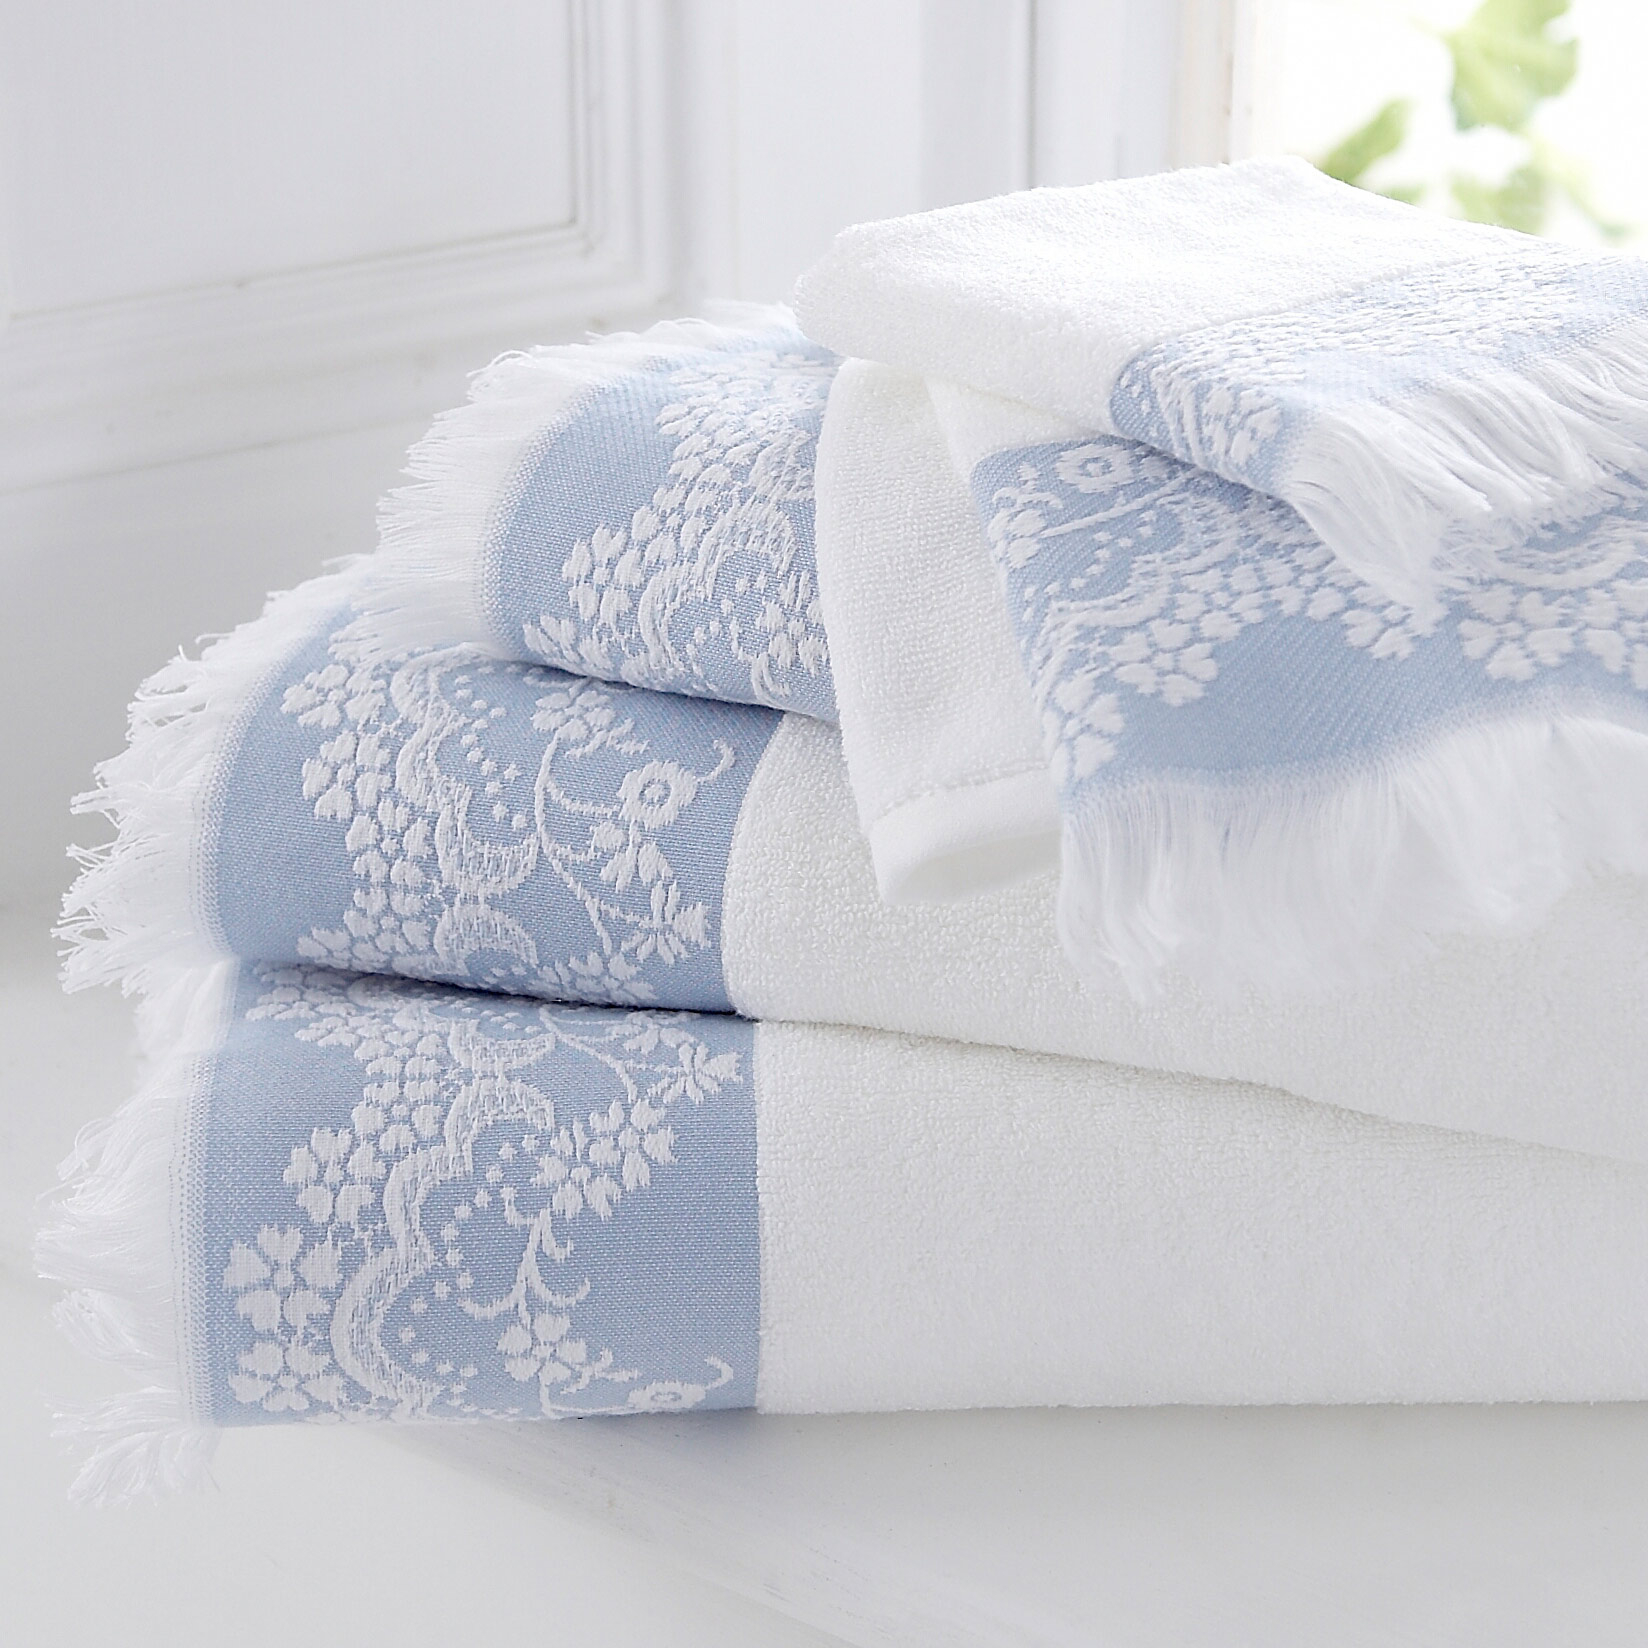 Riviera Cotton Towels